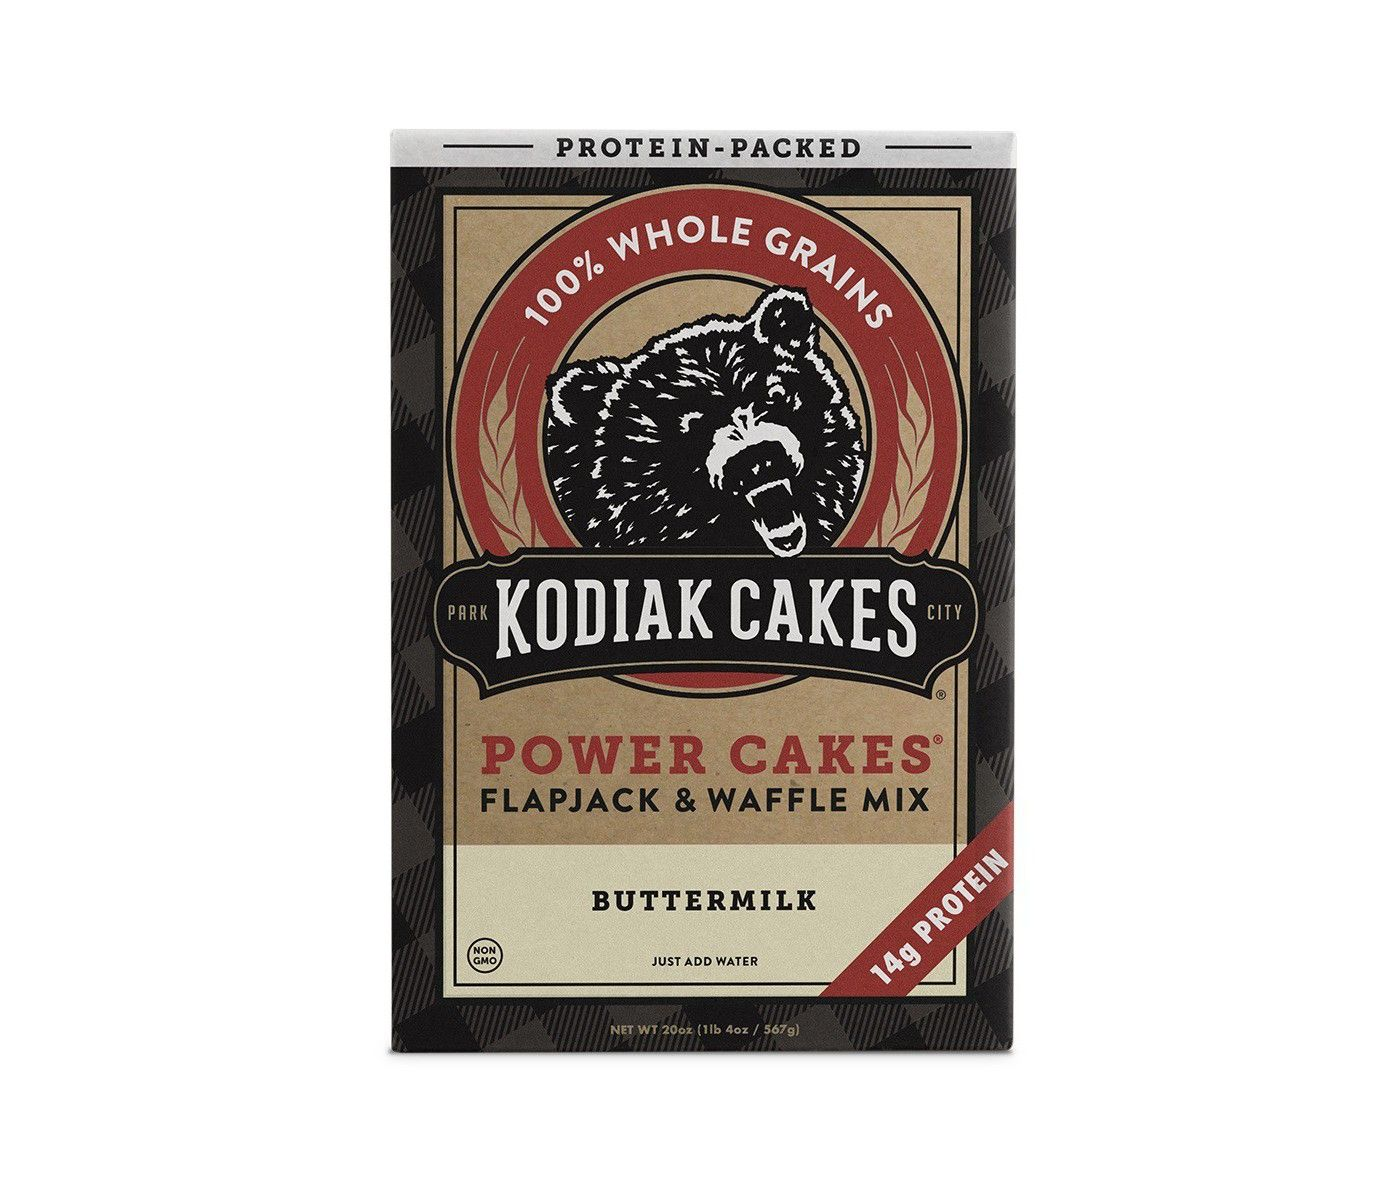 Kodiak Cakes Protein Packed Buttermilk Flapjack Waffle Mix 20oz Kodiak Cakes Peanut Butter Flapjacks Kodiak Cakes Protein